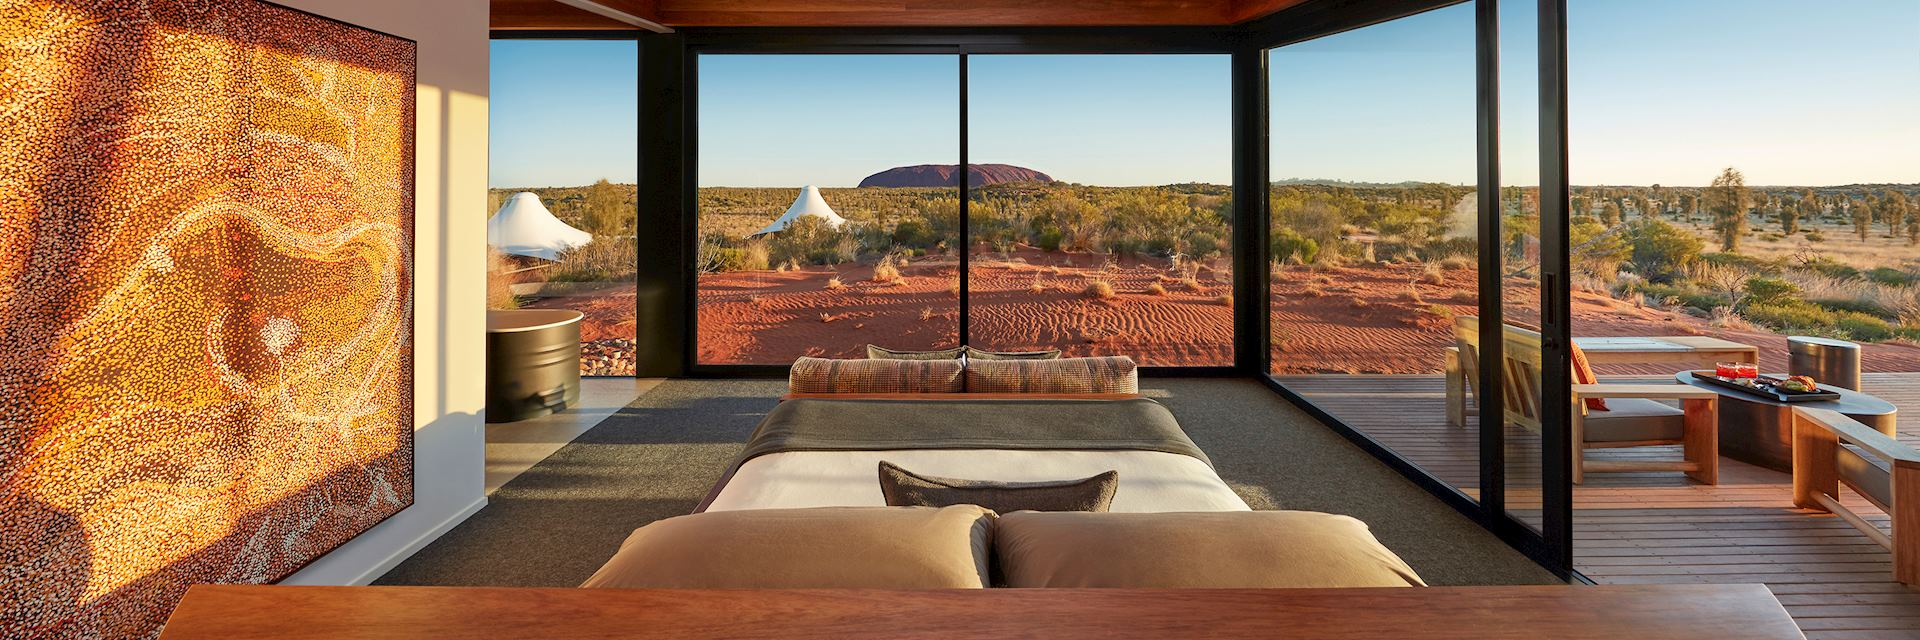 Longitude 131°, Dune Pavilion Bedroom